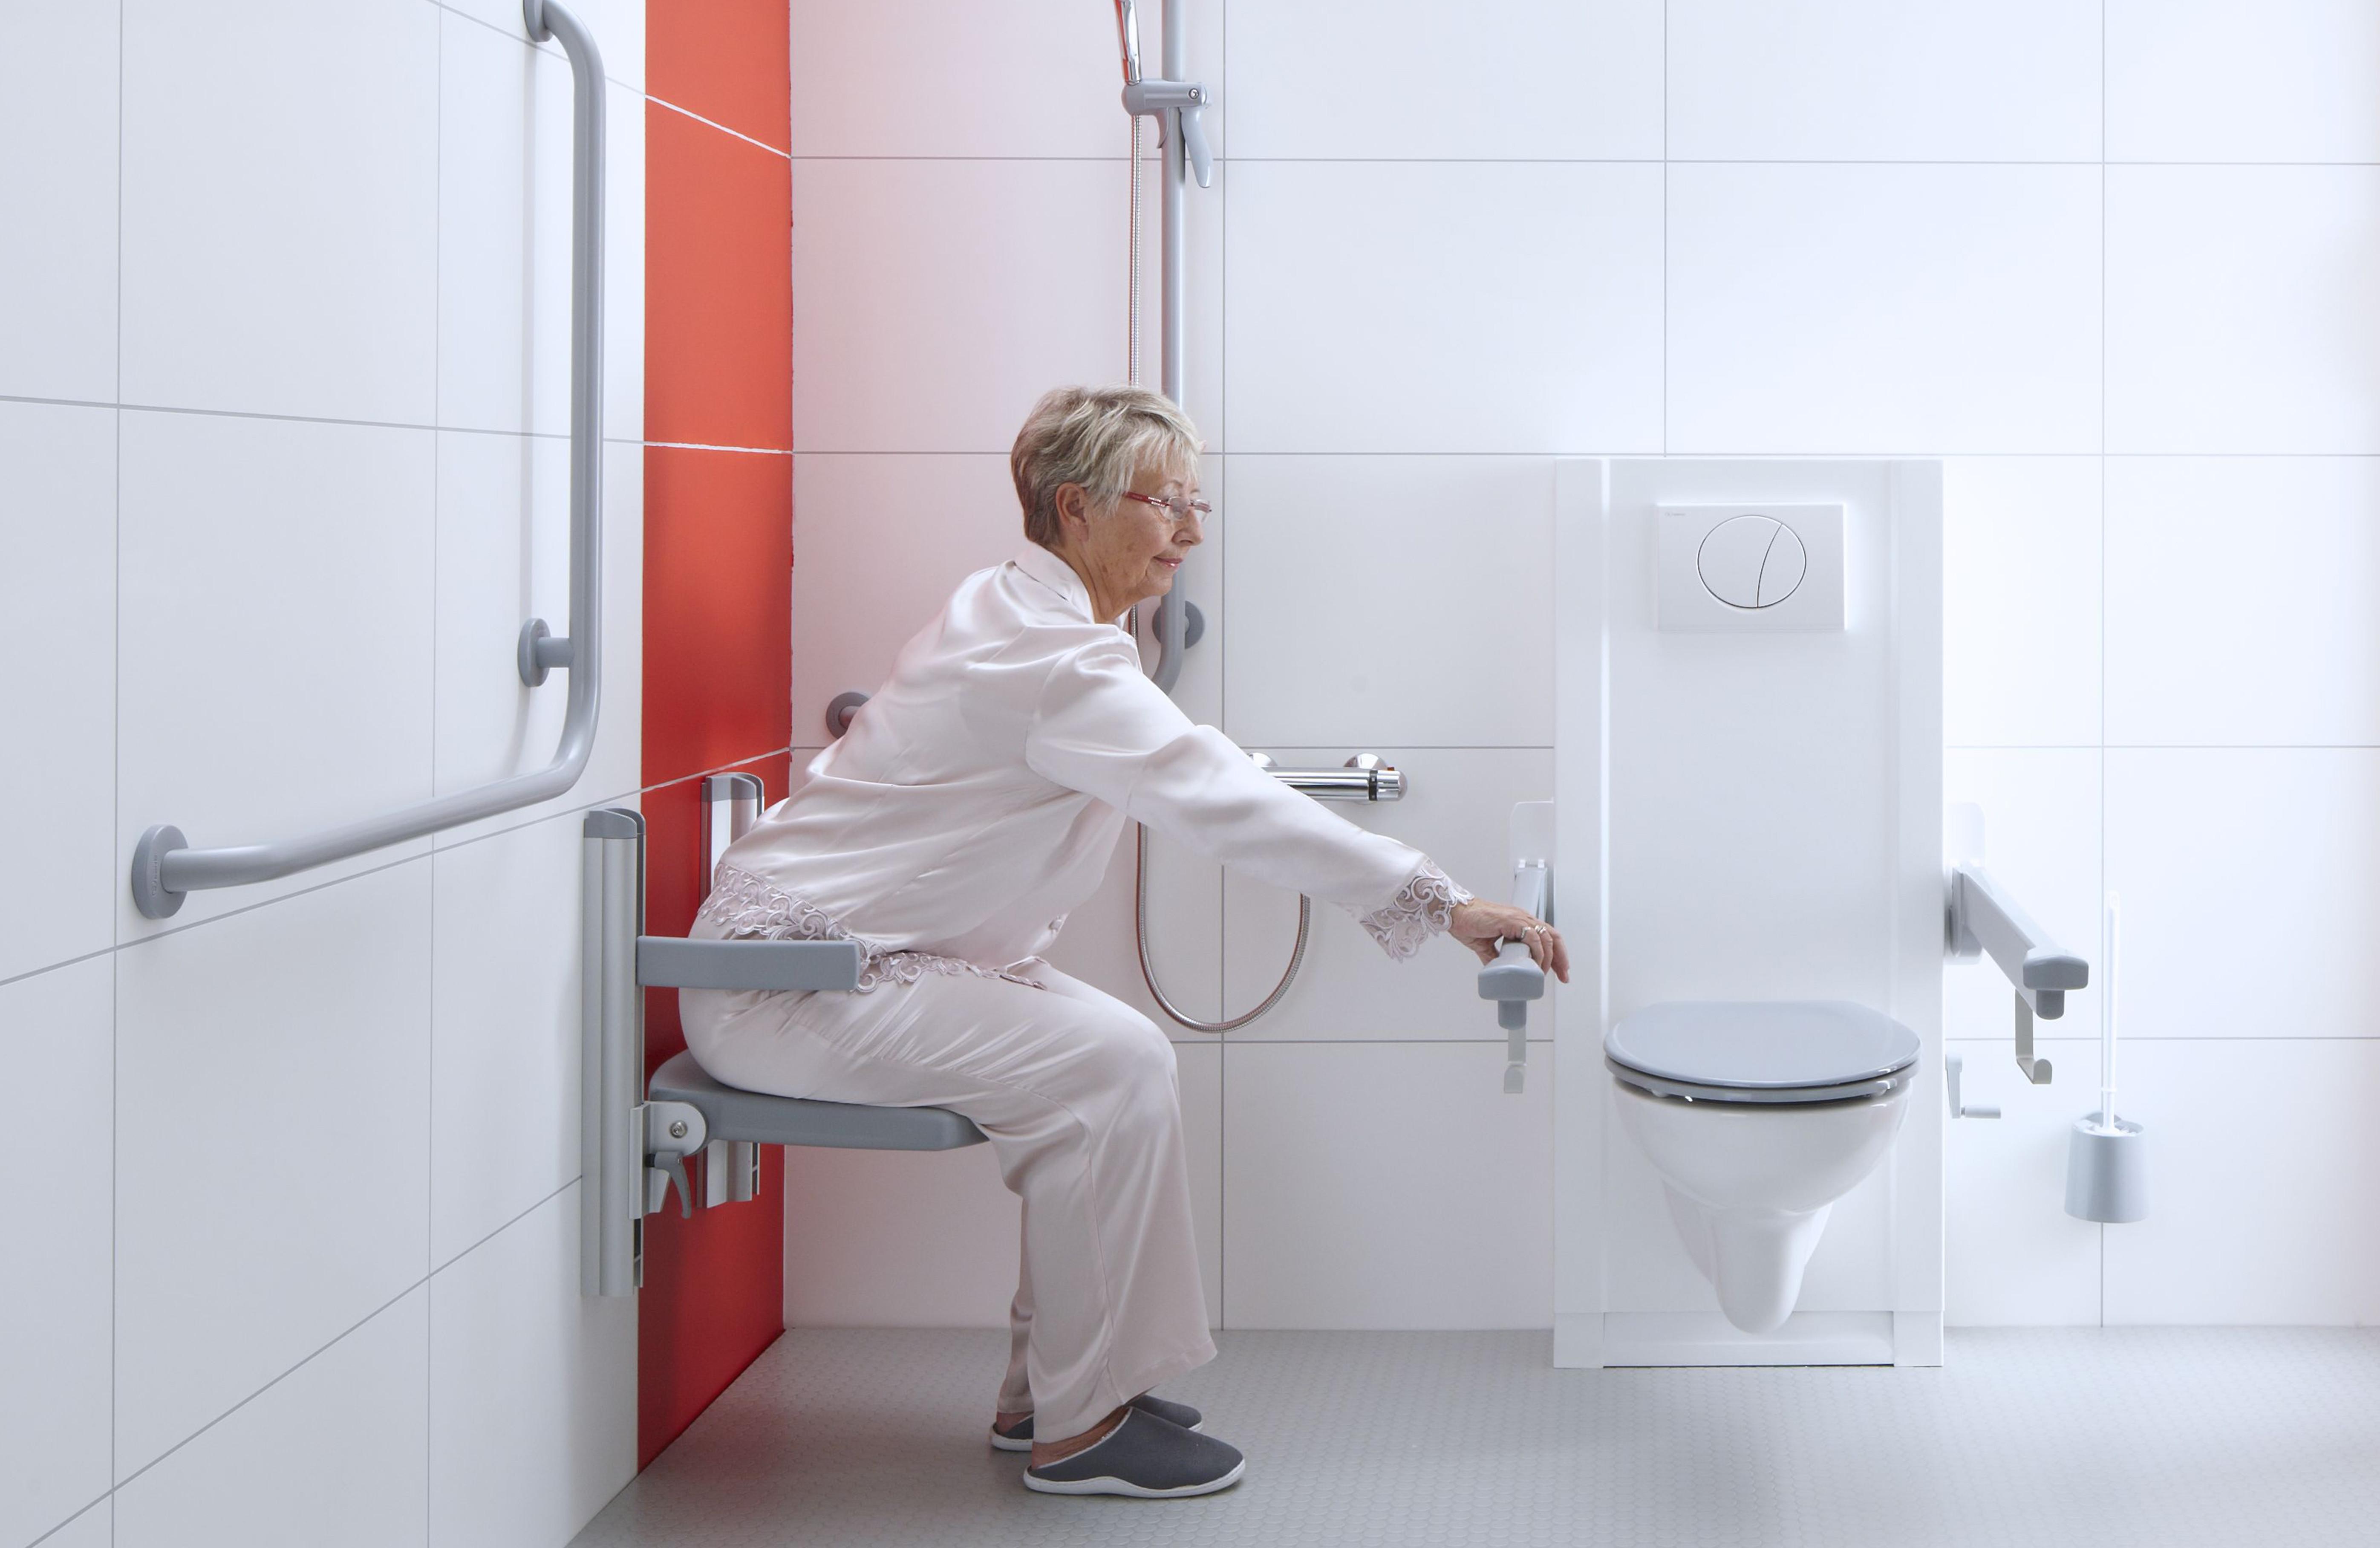 Badkamer Wastafel Hoogte : Opklapbaar douchezitje aangepaste badkamers bano zorgbadkamers